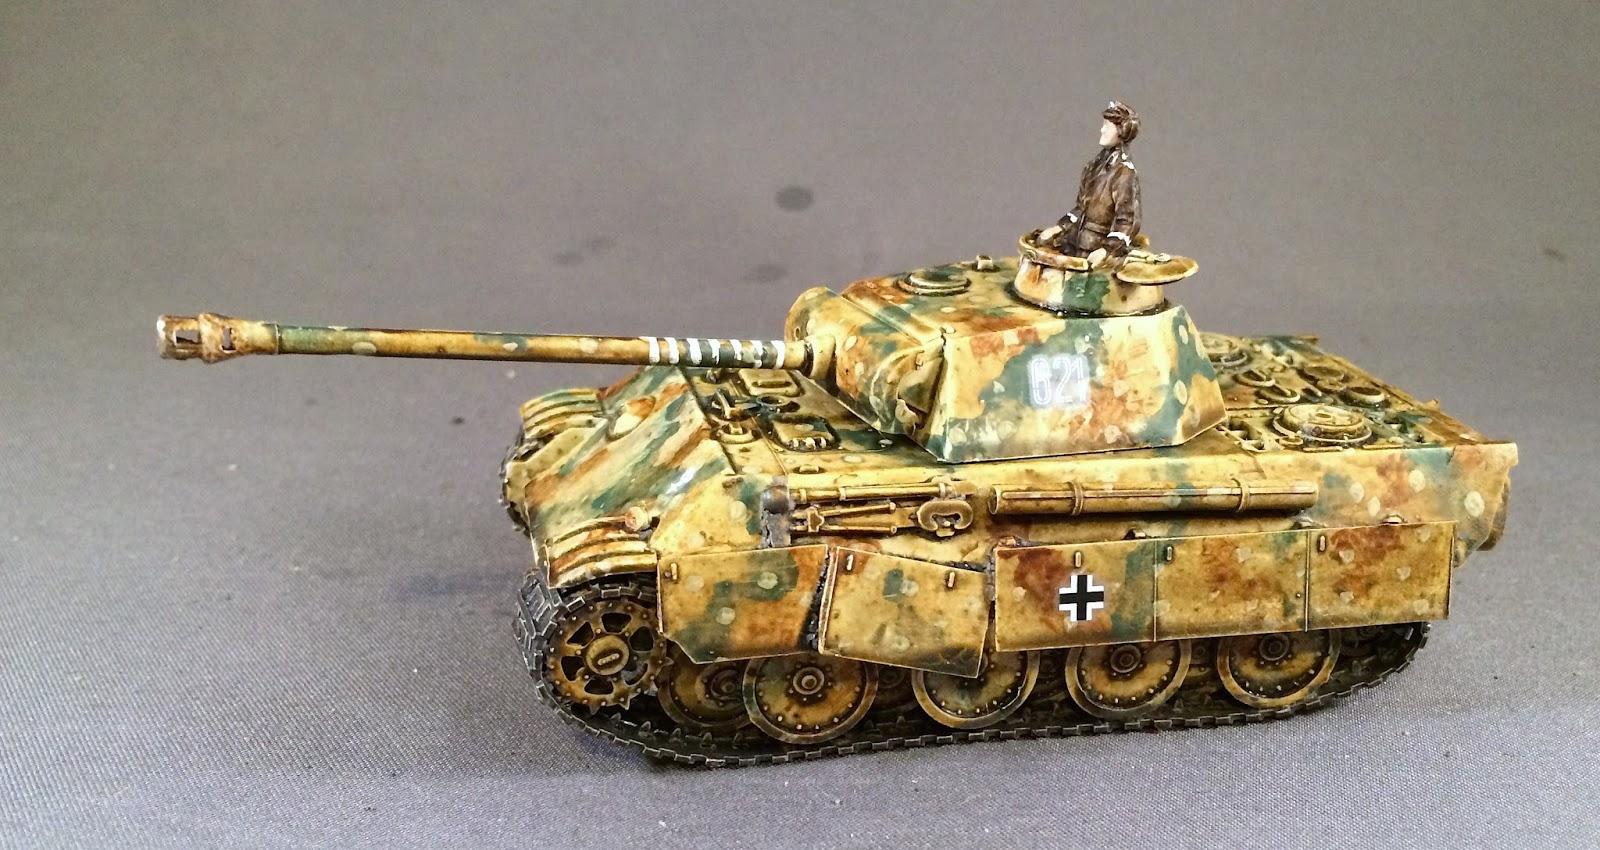 Bob's Miniature Wargaming Blog: Some WW2 tanks